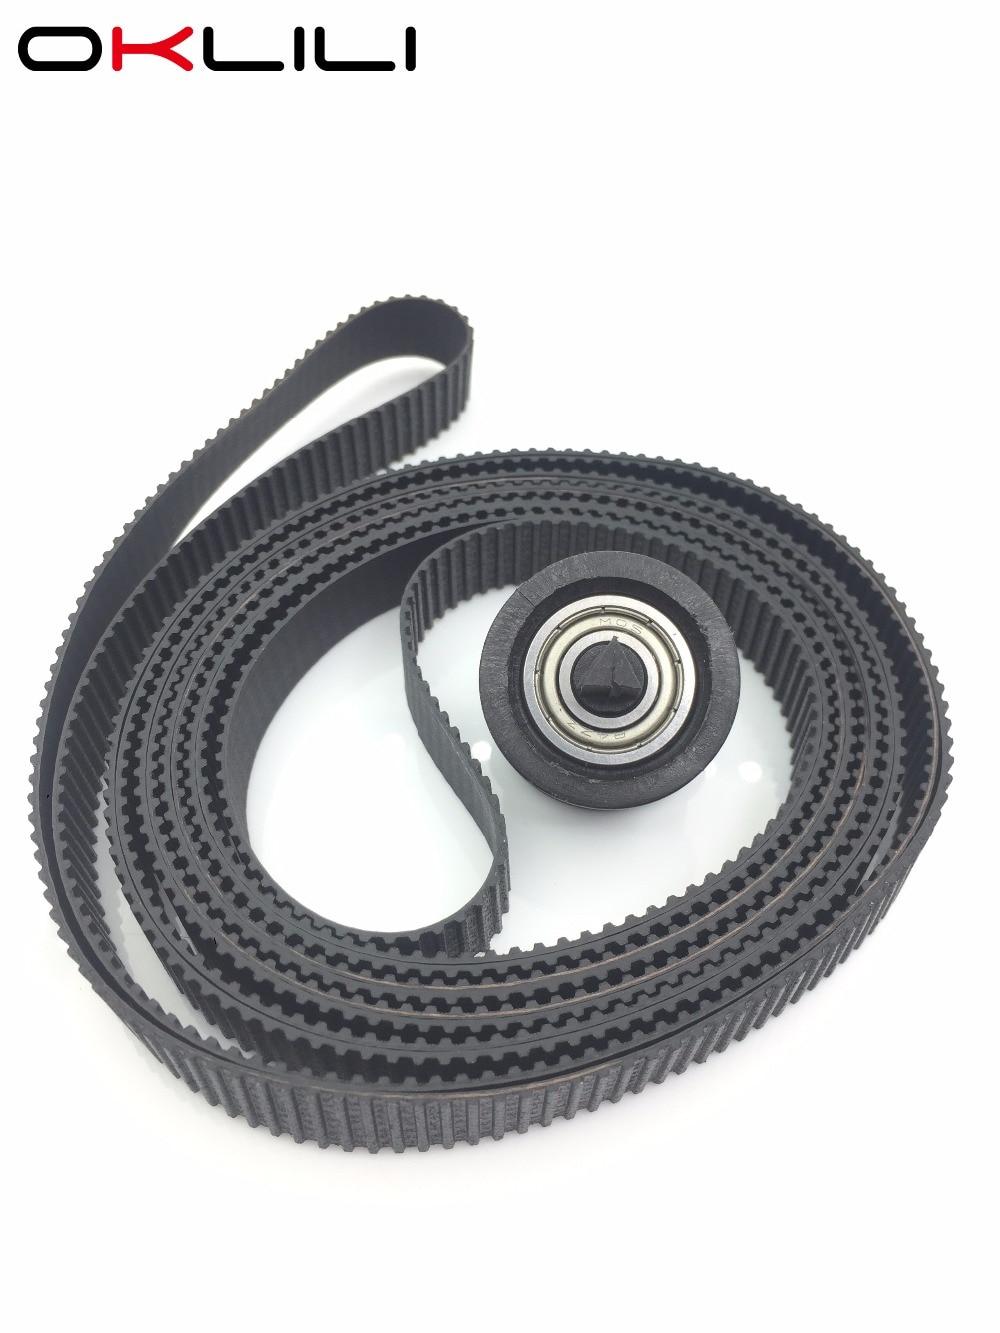 Carriage Belt com Polia 24 C7769-60182 ''24 polegada A1 para HP DesignJet 500 500 ps 510 510 ps 800 800 ps Plus 4500 820 MFP 4020 T620